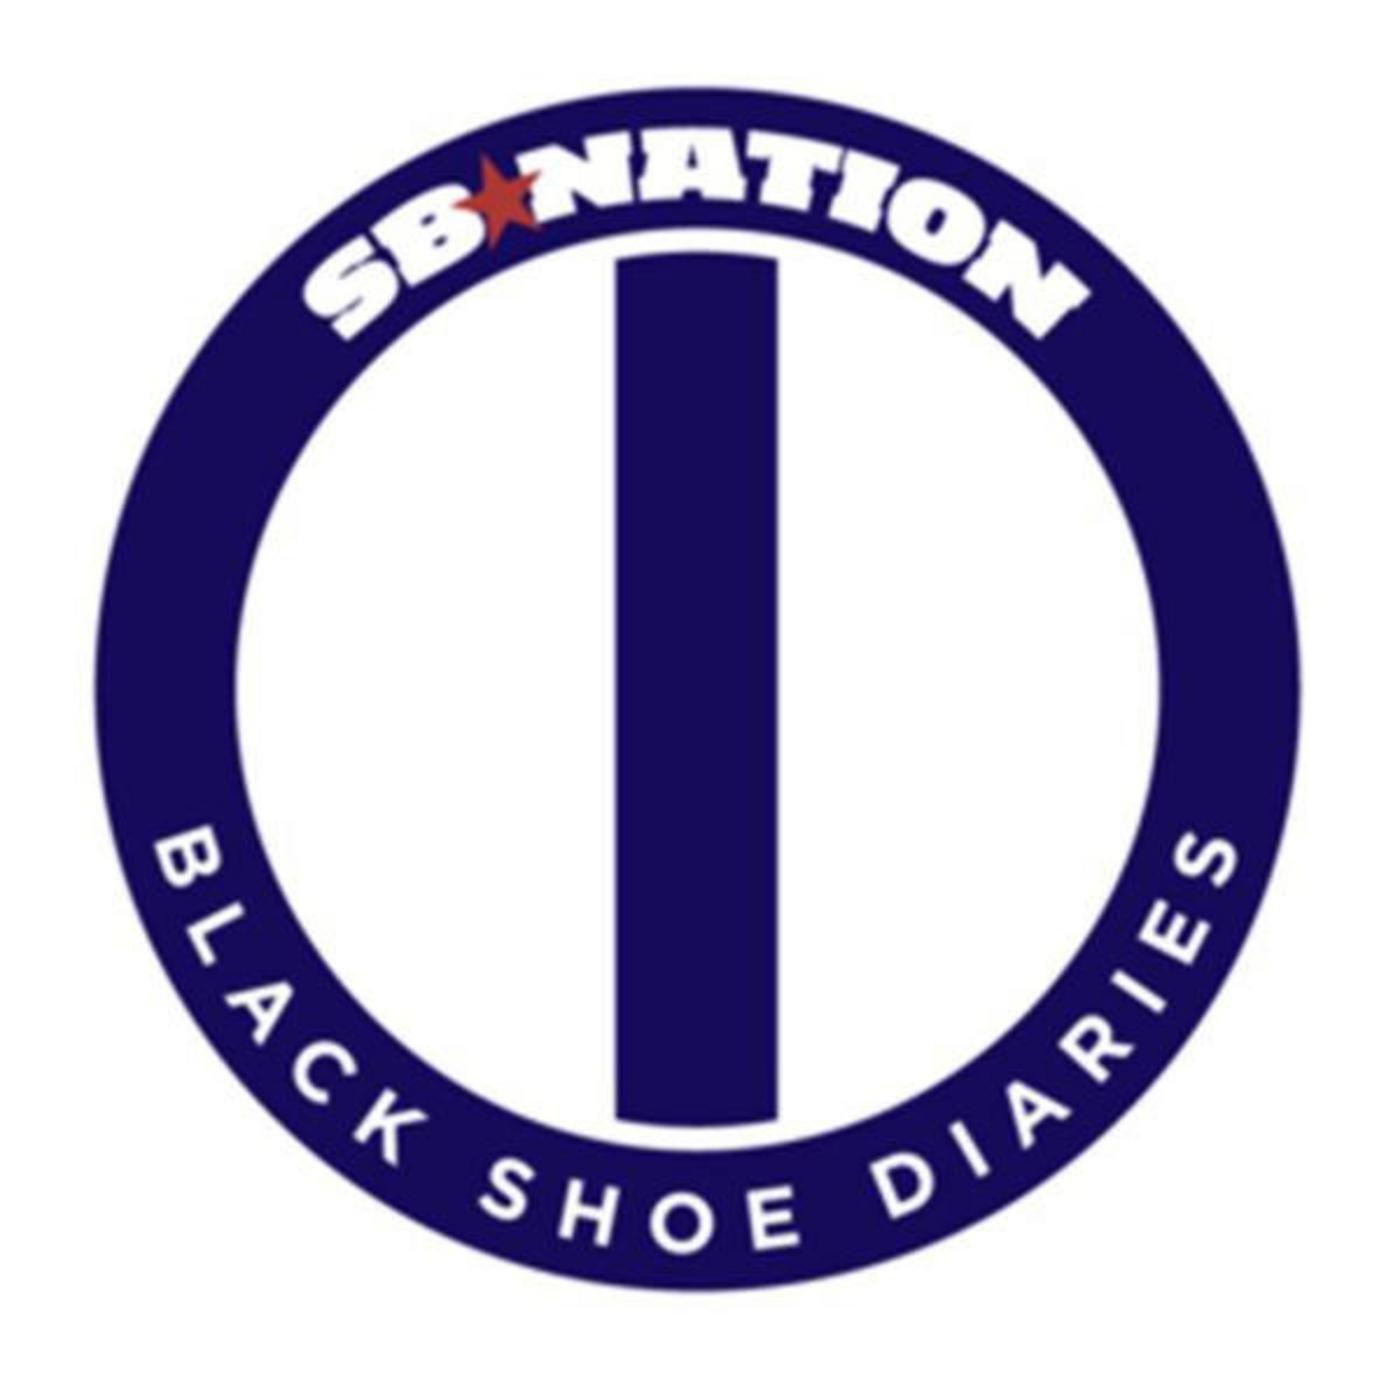 Black Shoe Podcast - Episode 1.4 - Eastern Michigan